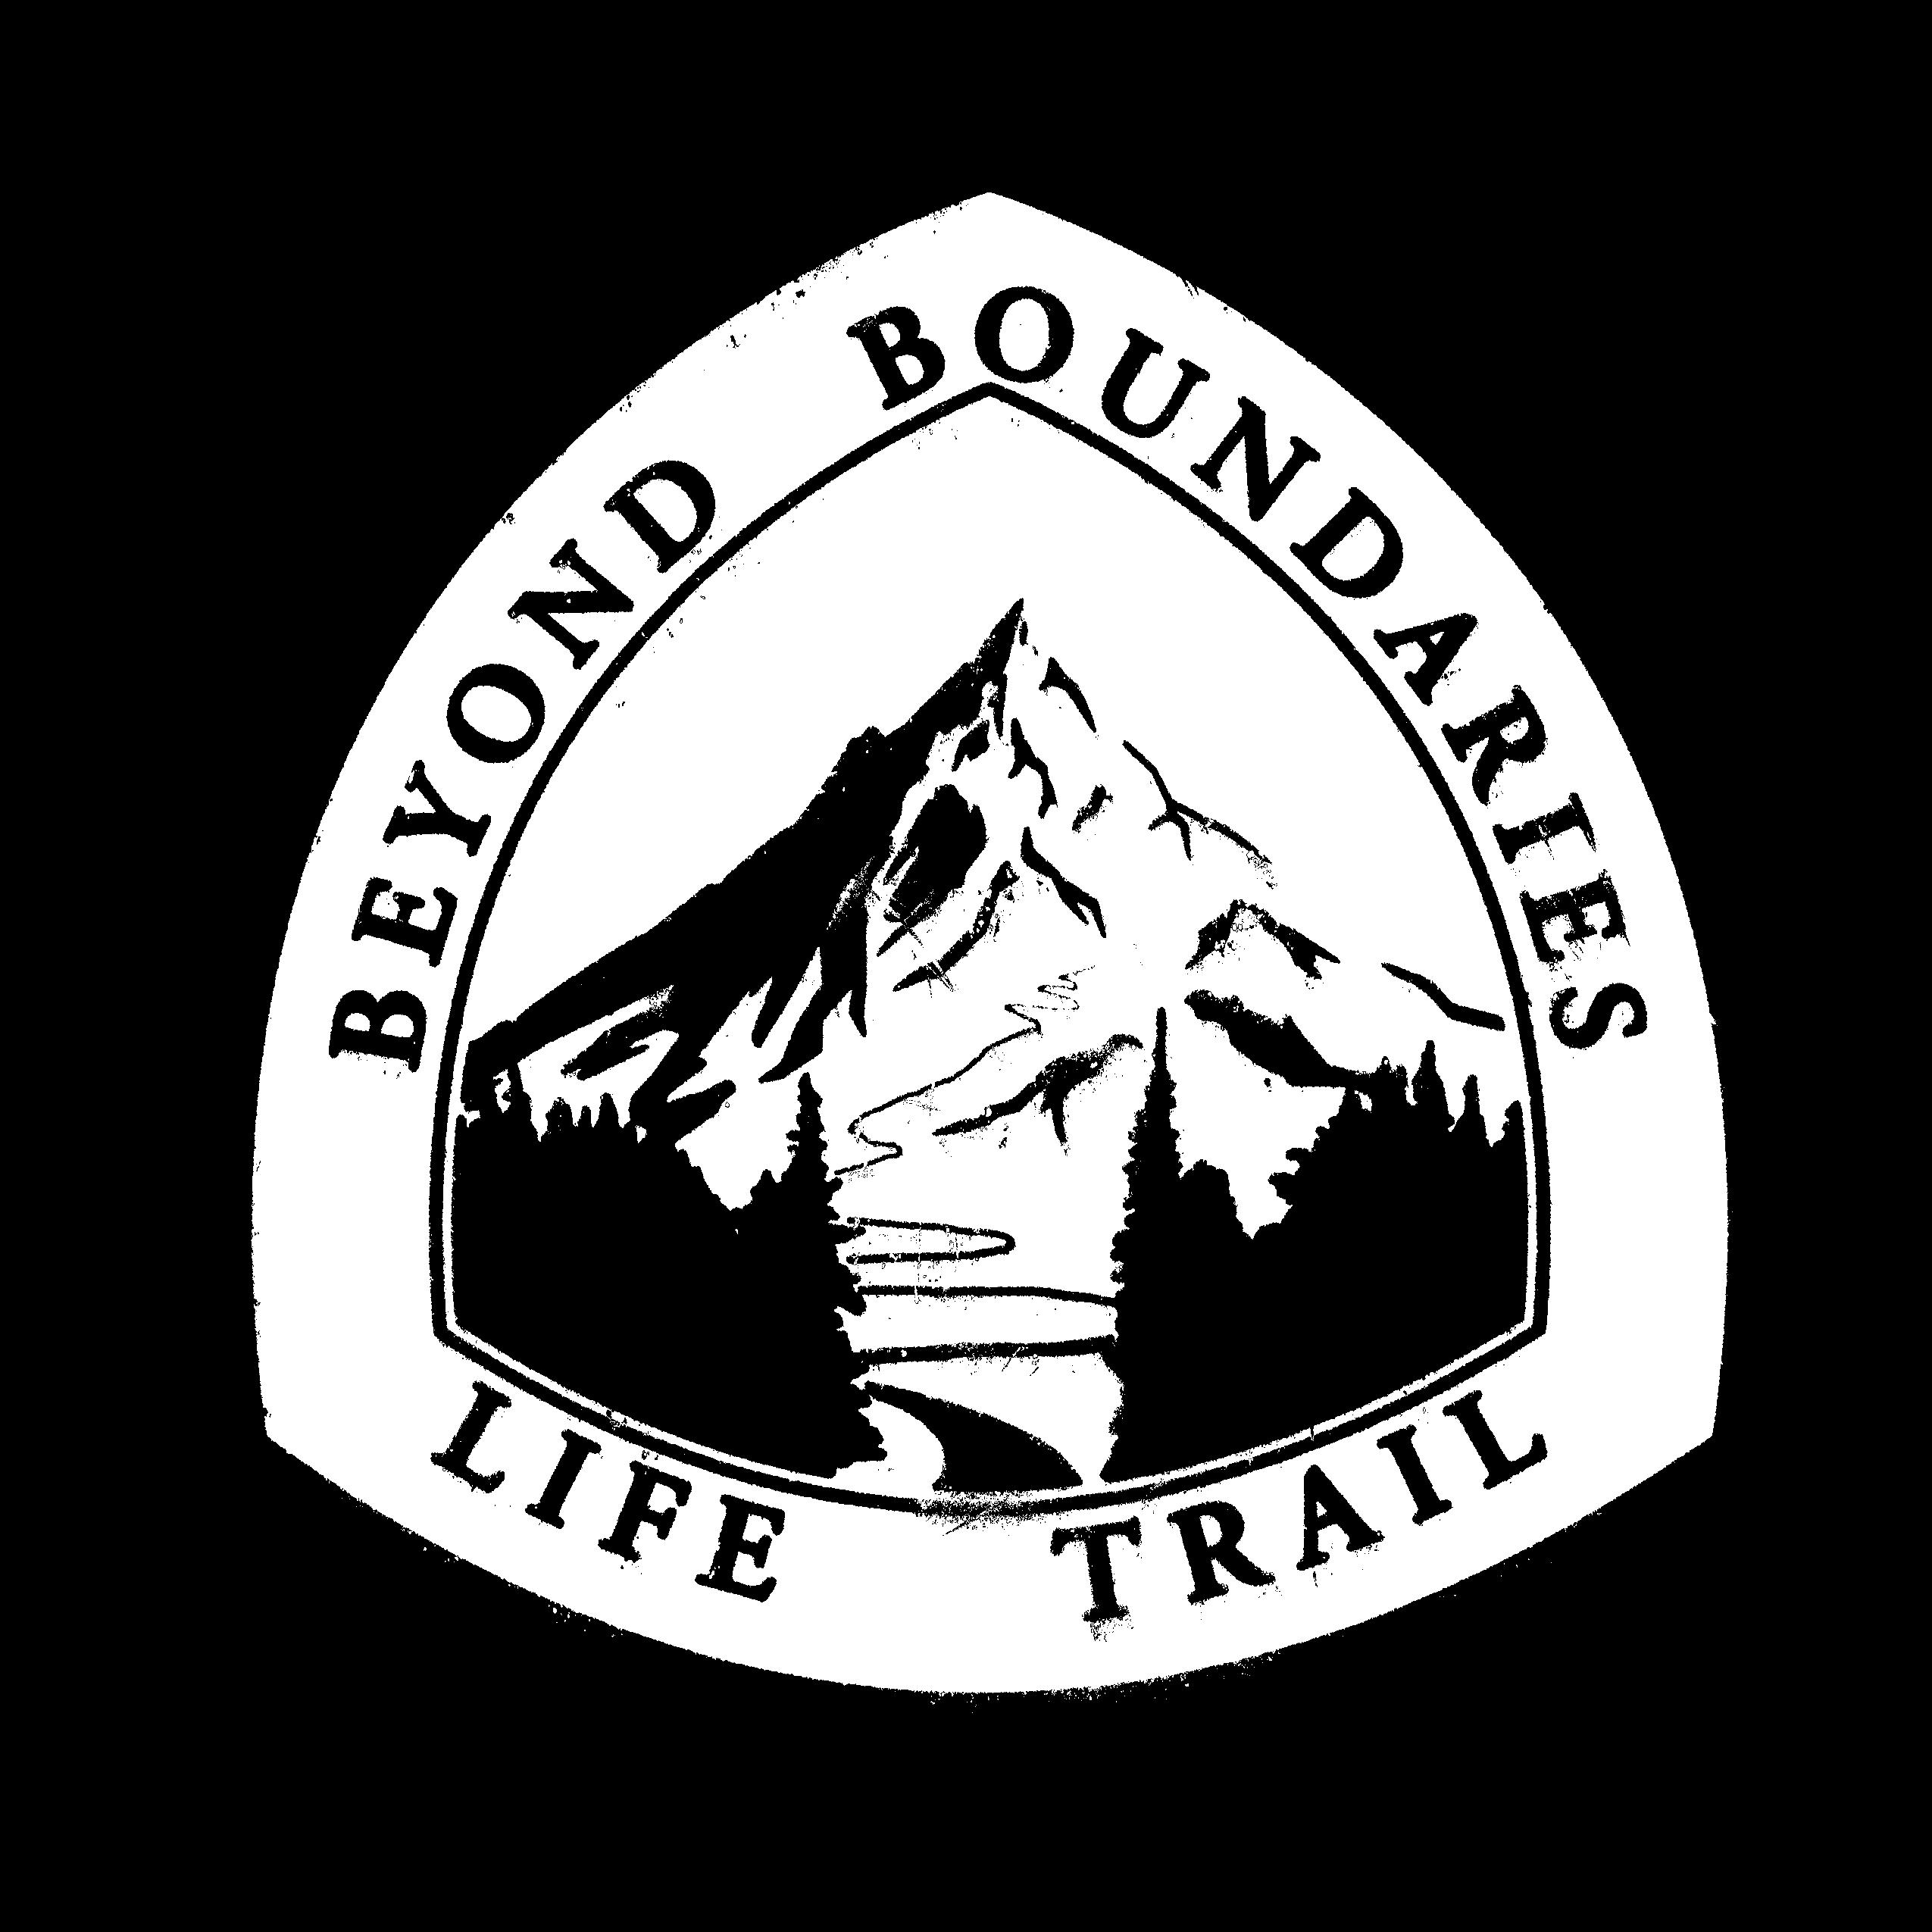 Beyond Boundaries Life